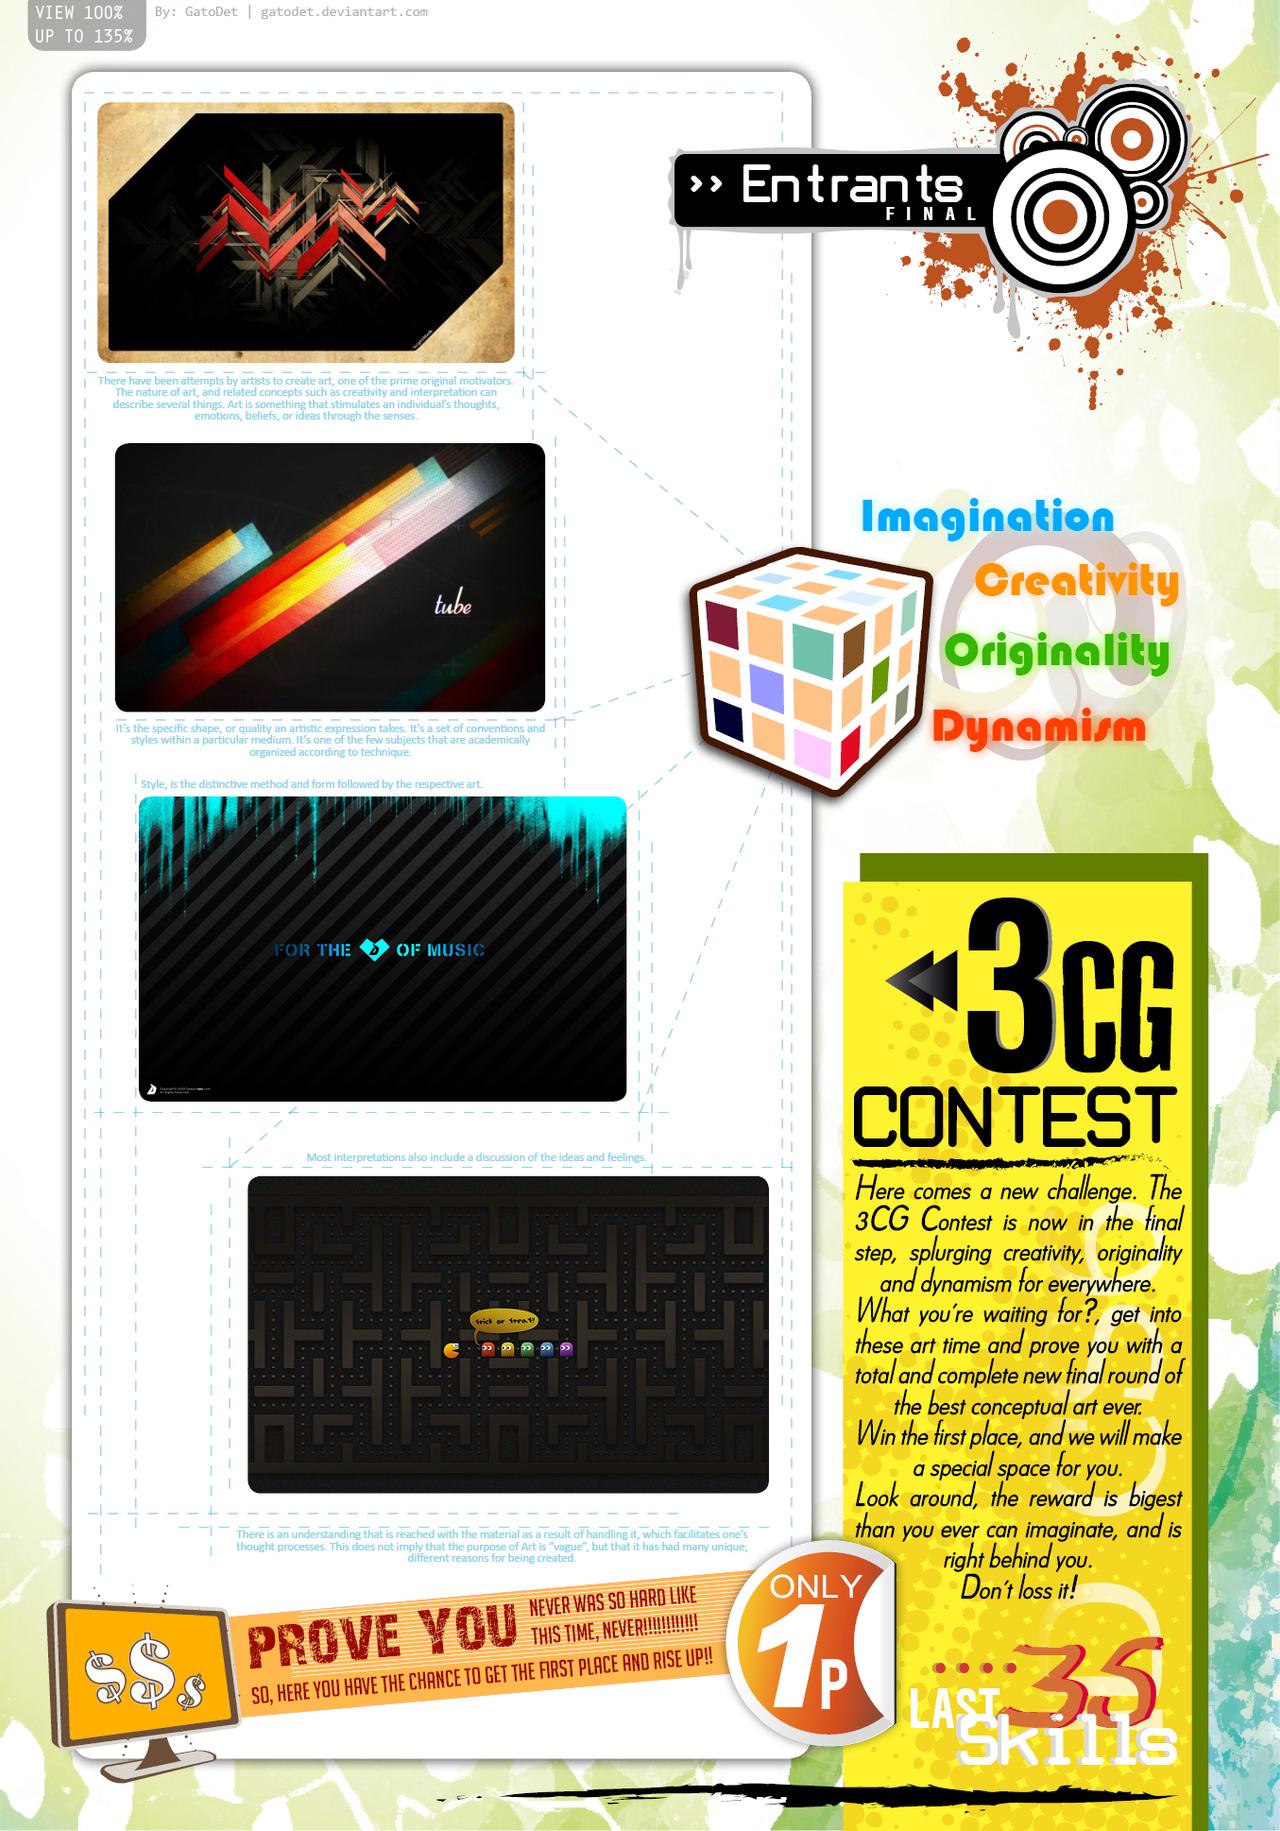 3cg contest edesign by gatodet on deviantart for Edesign login